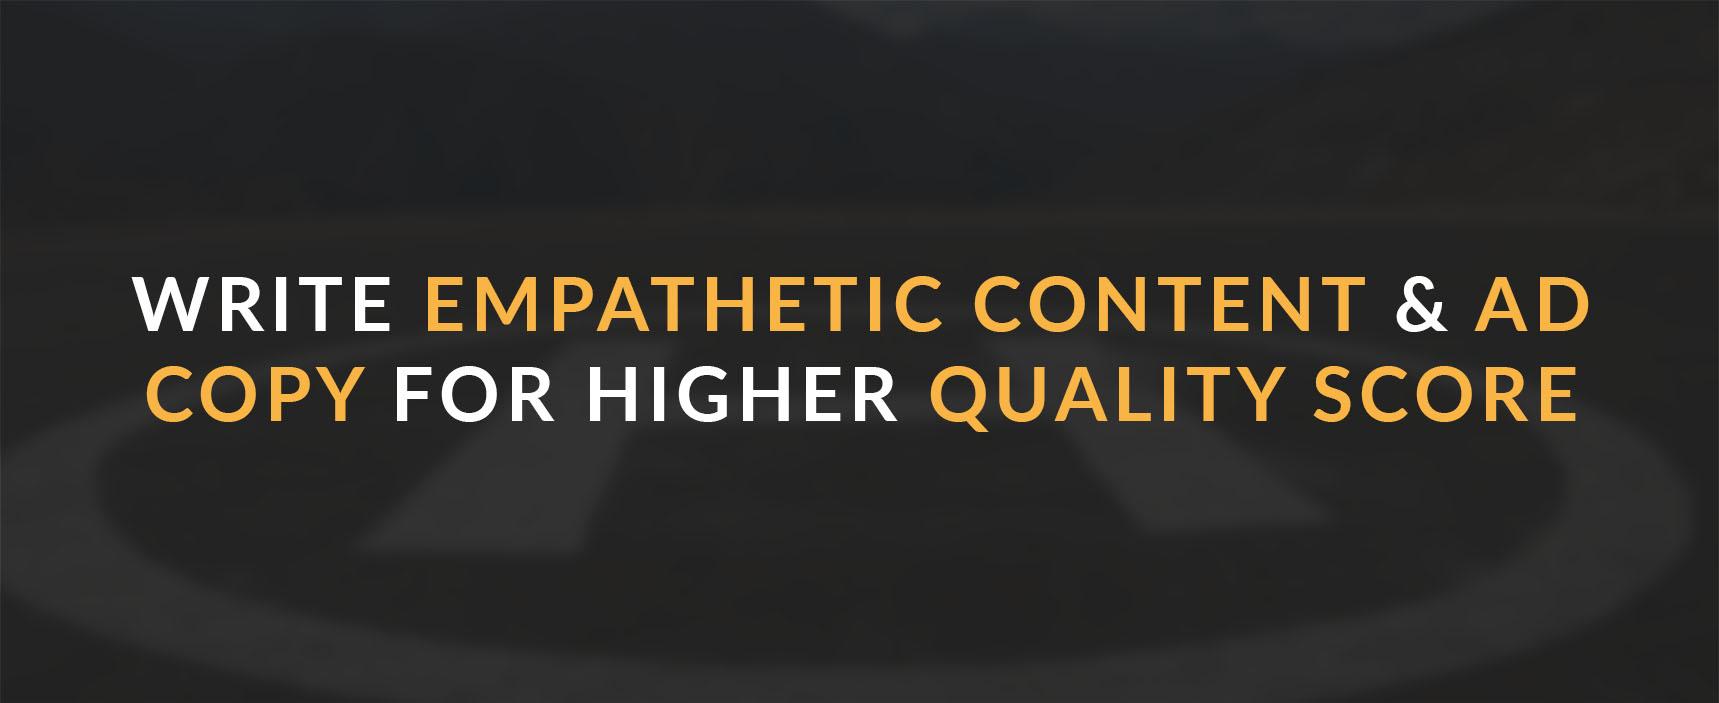 08_empathetic_content_QS